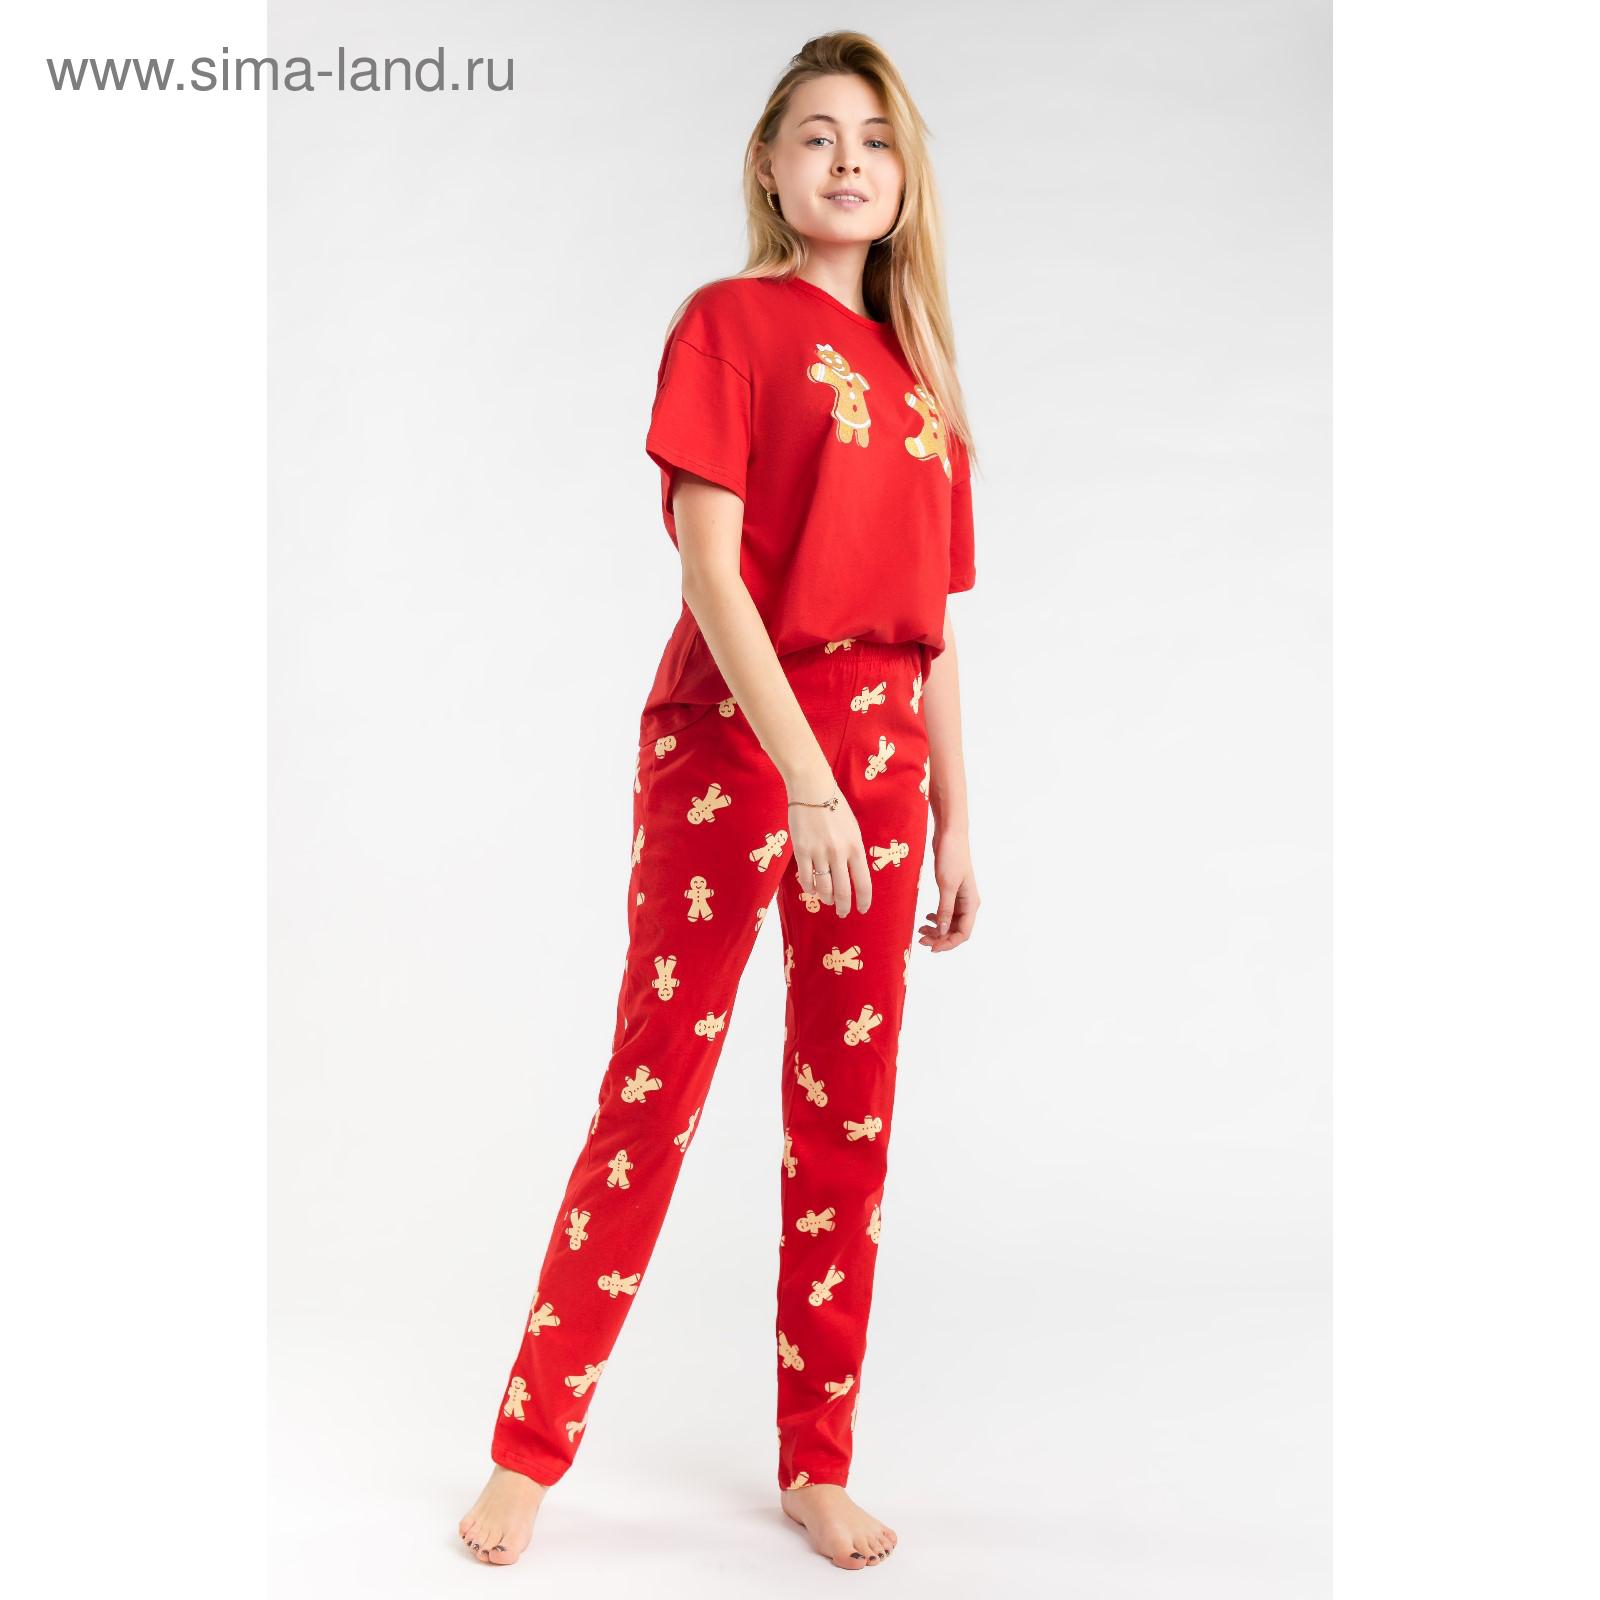 Пижама женская (футболка ac3da539a197e